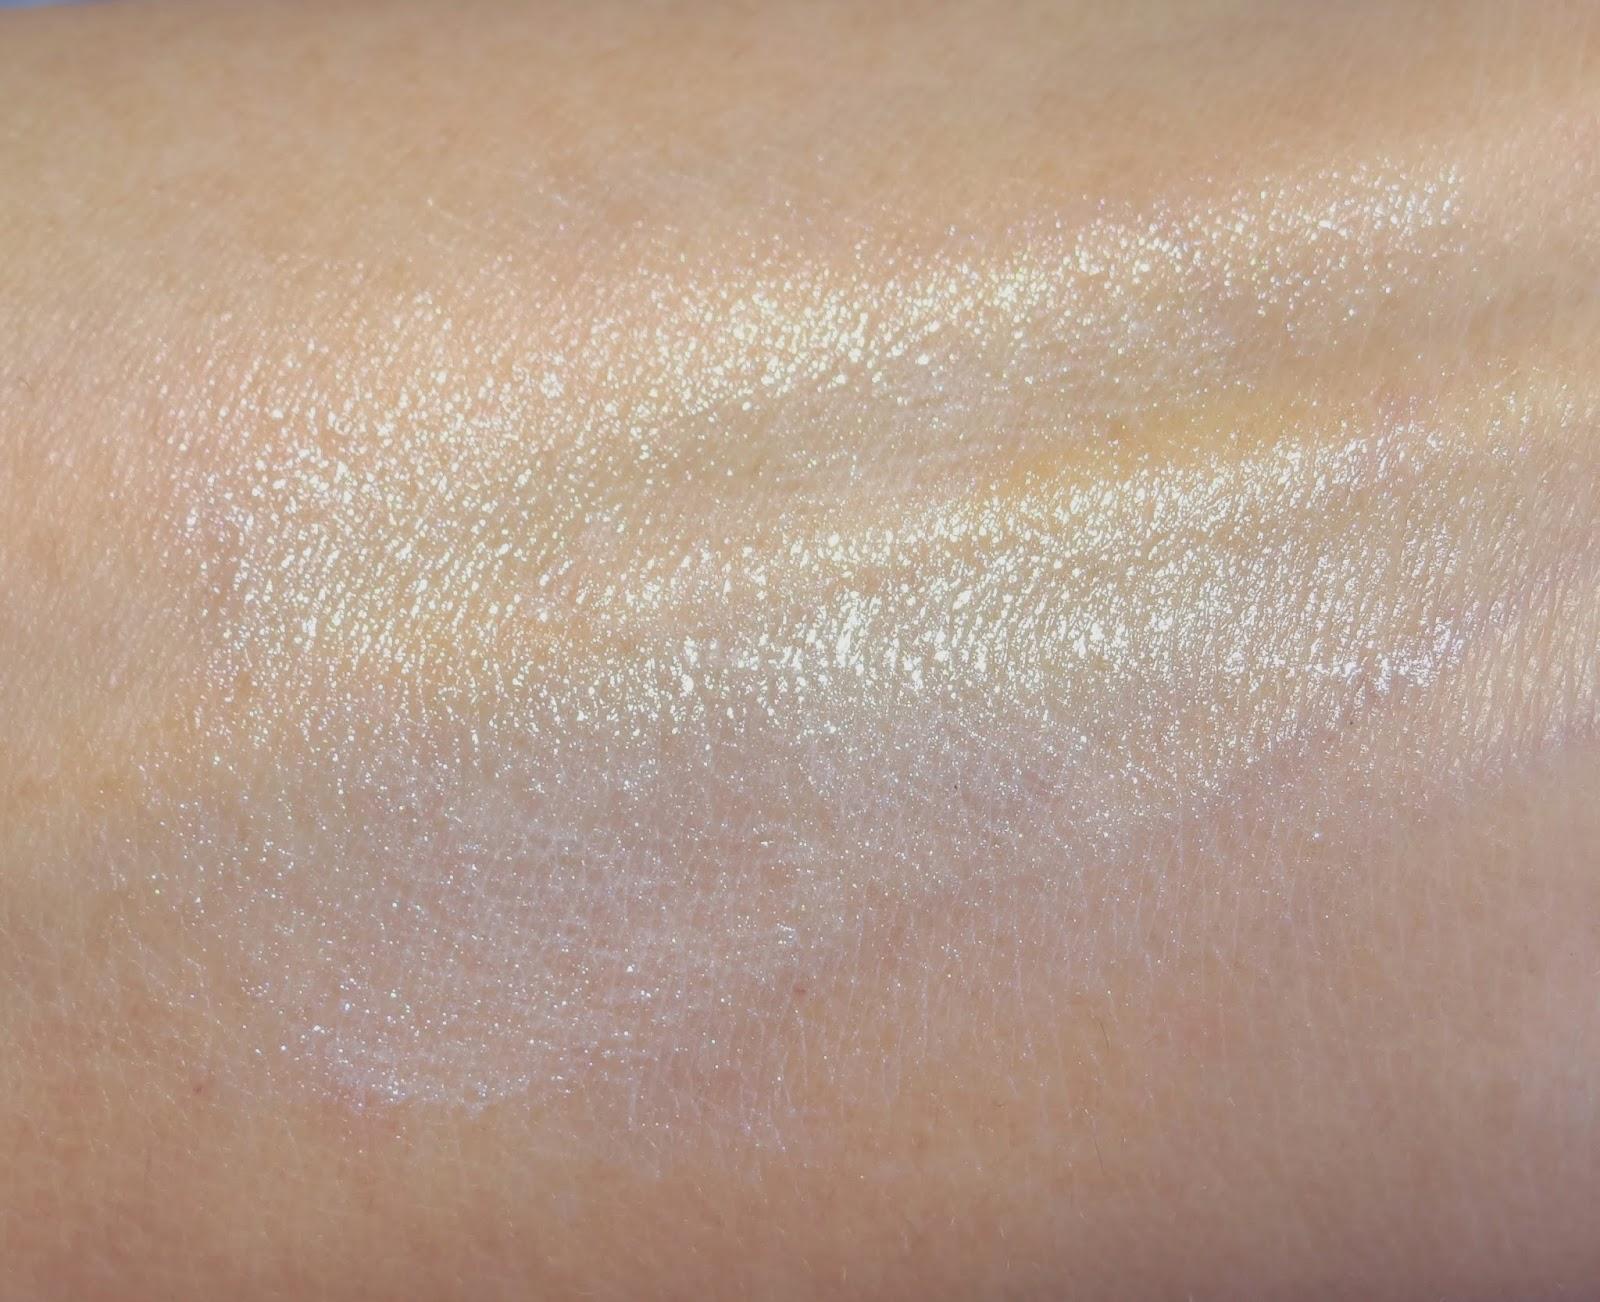 The Body Shop Moisture White Shiso 2 in 1 Brightening Eye Cream - Review